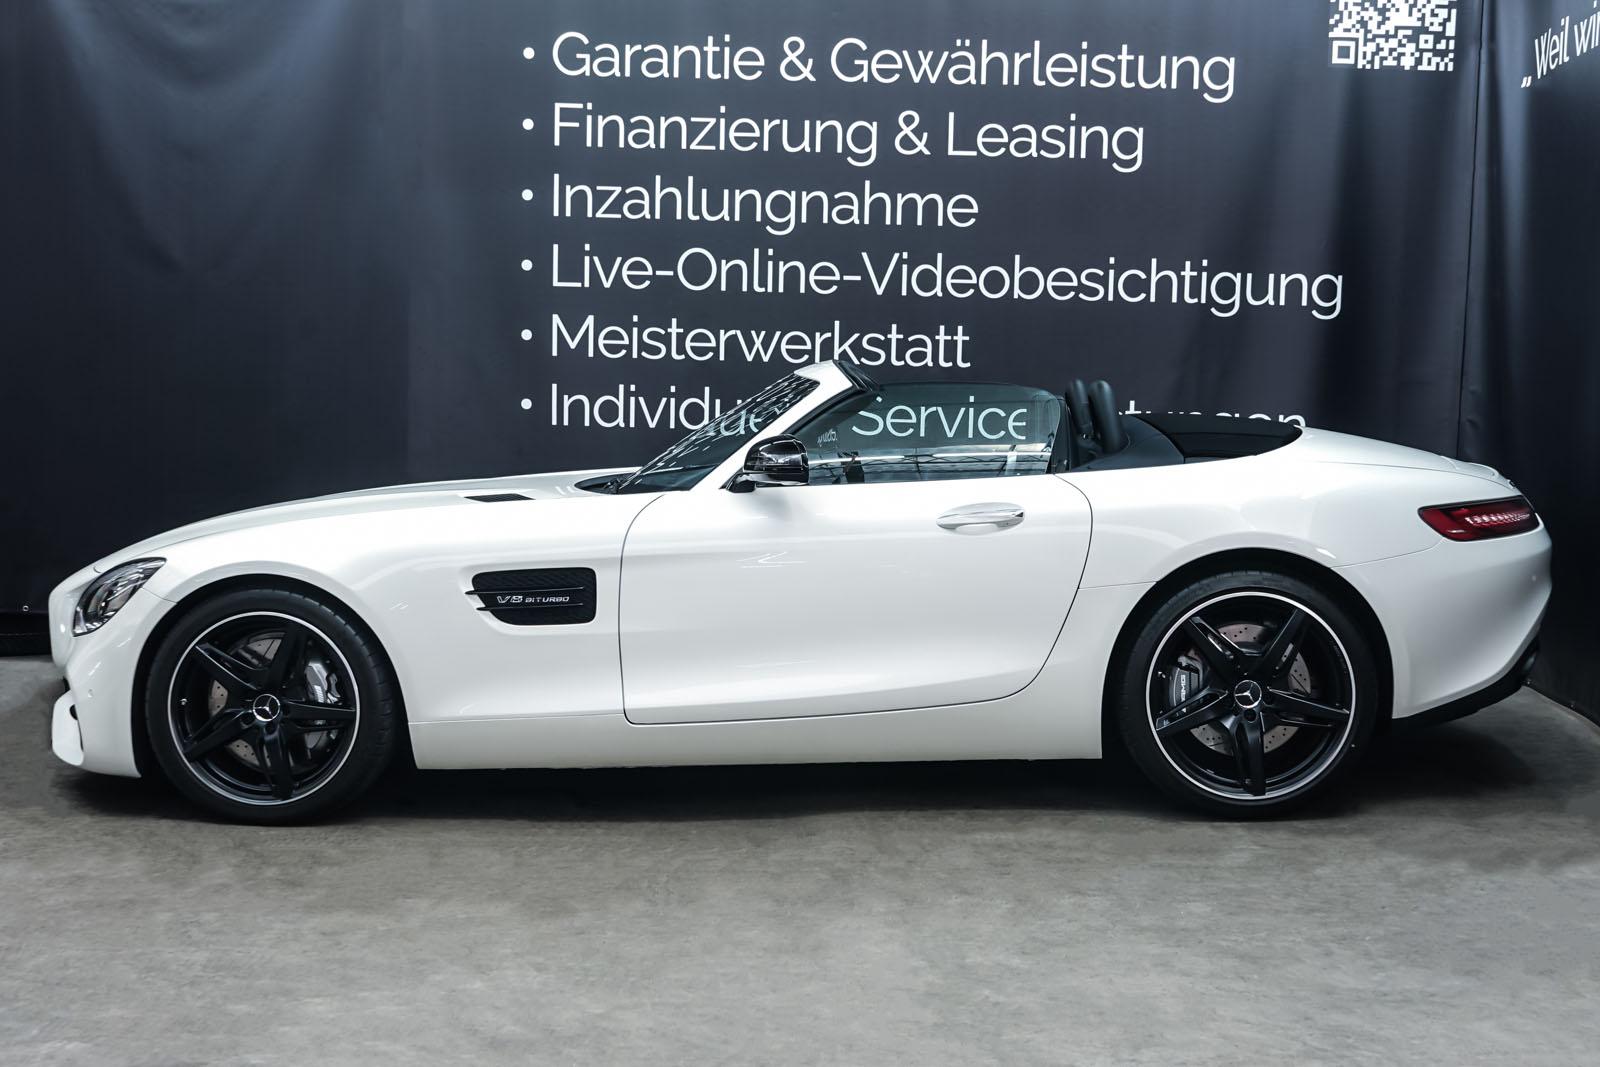 11Mercedes_Benz_AMG_GT_Roadster_Weiss_Schwarz_MB-9710_6_w